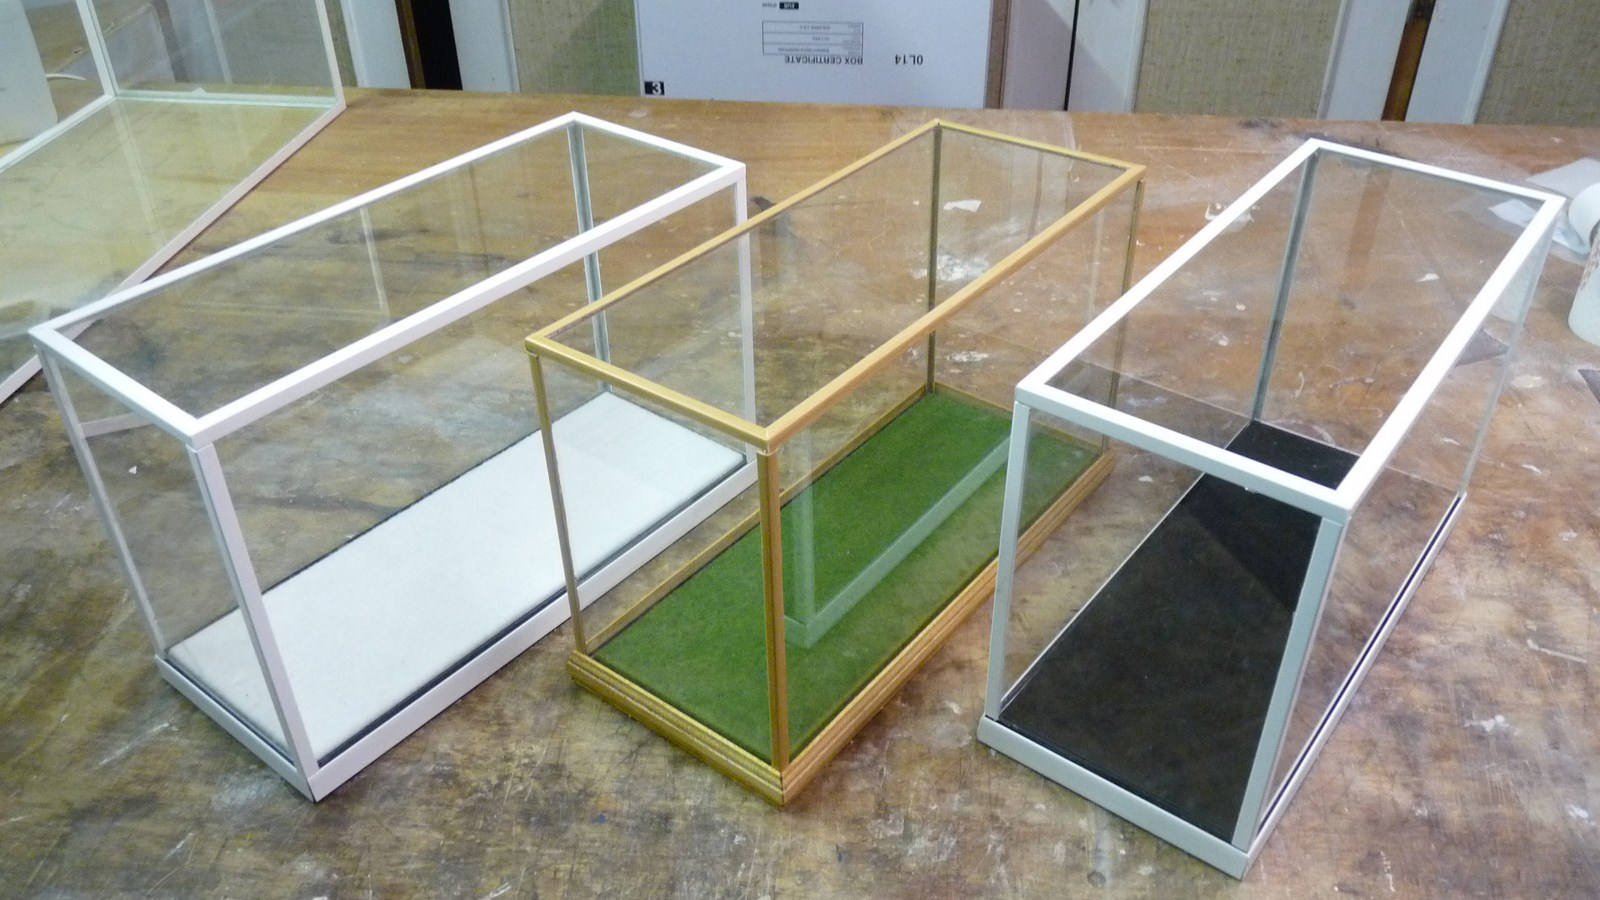 Fabriquer ses propres vitrines en verre 17071907271723134915156560